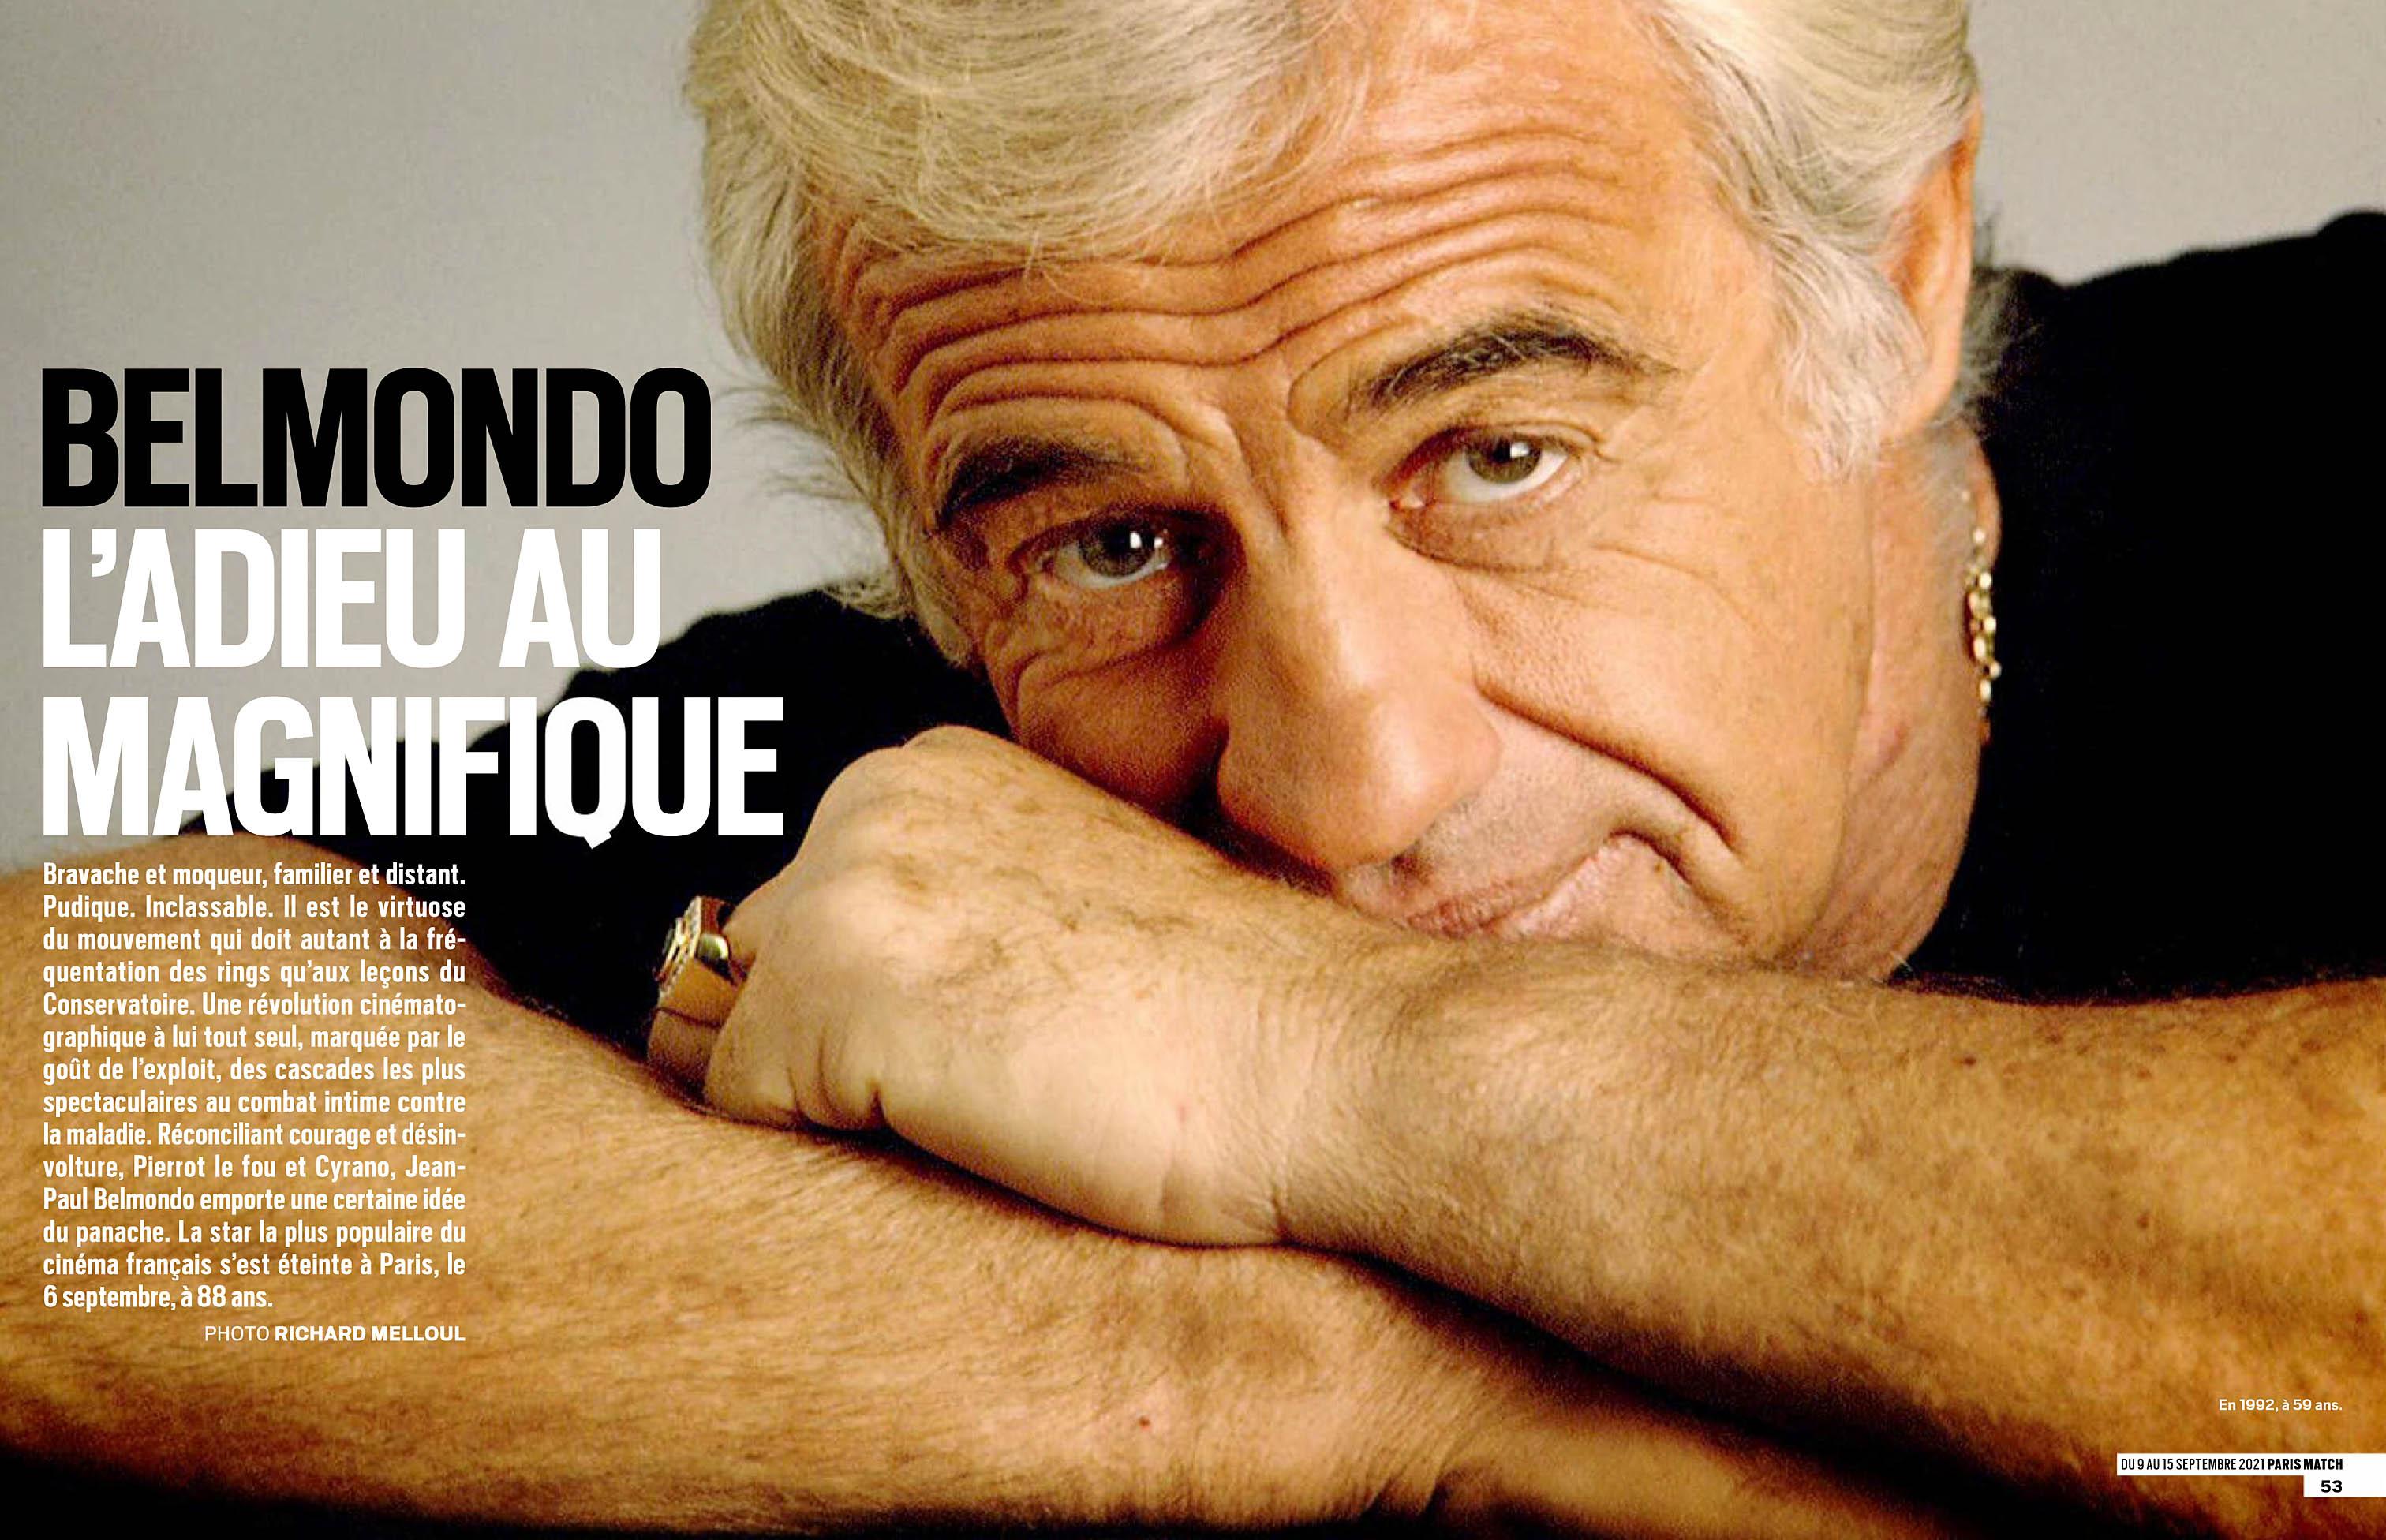 Paris Match 210909 Belmondo 01.jpg